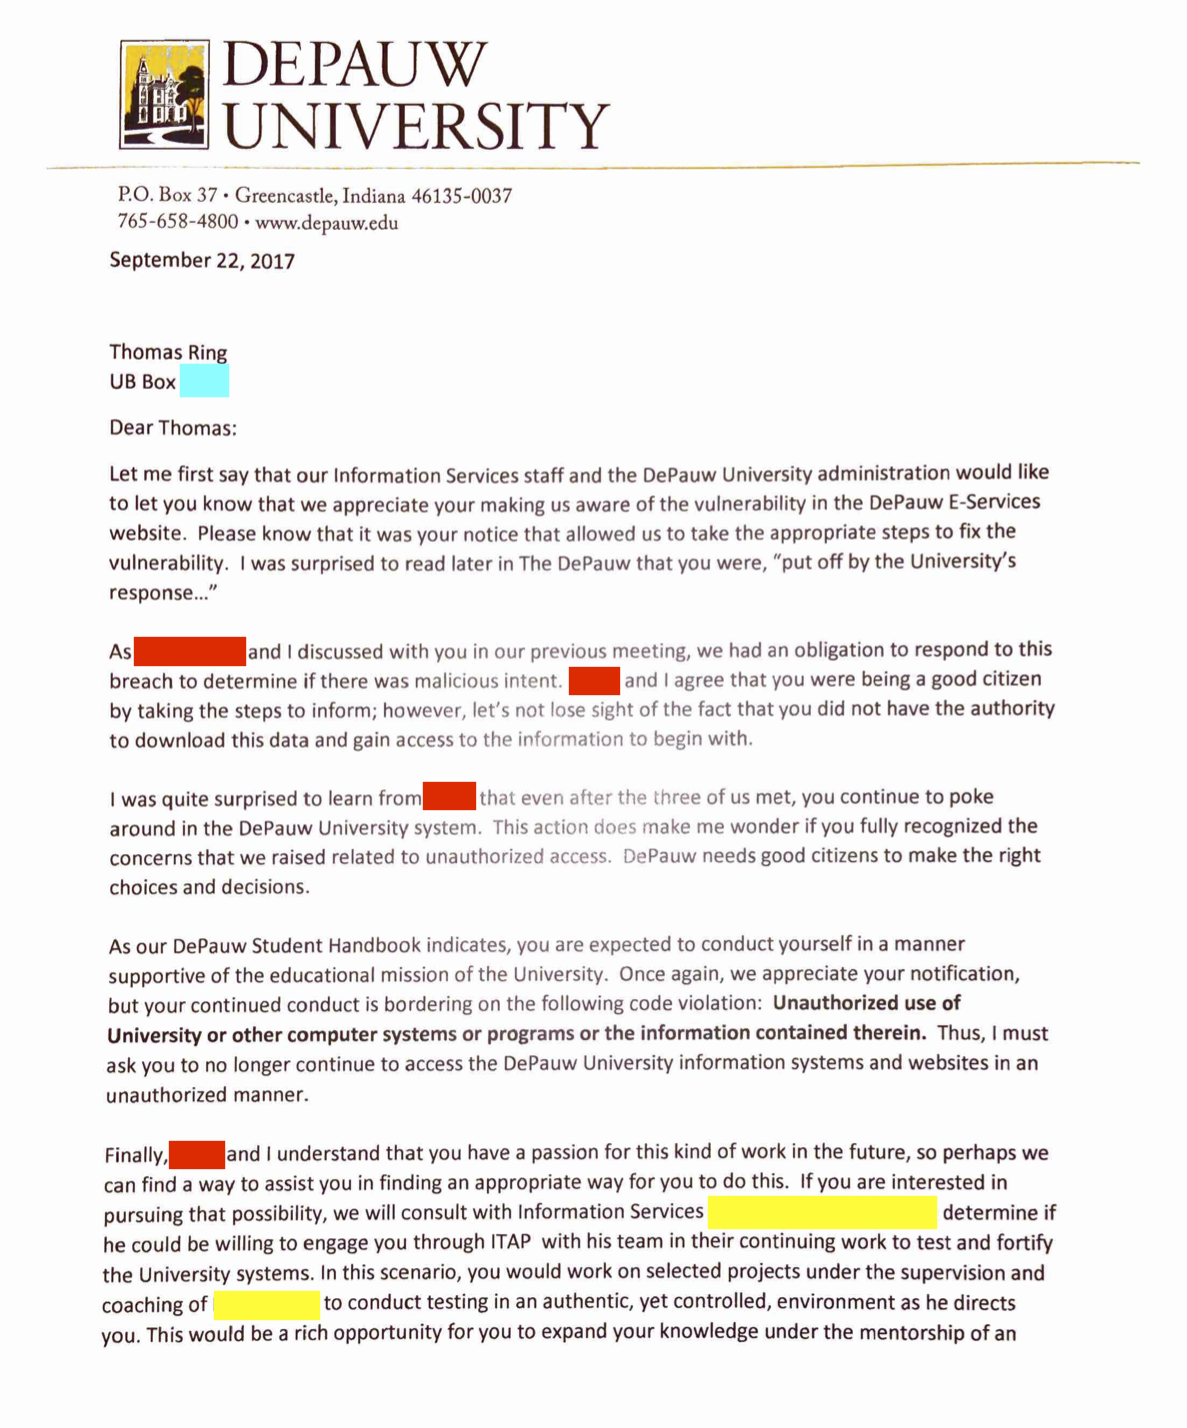 How I Hacked DePauw University Using Hidden Inputs - By